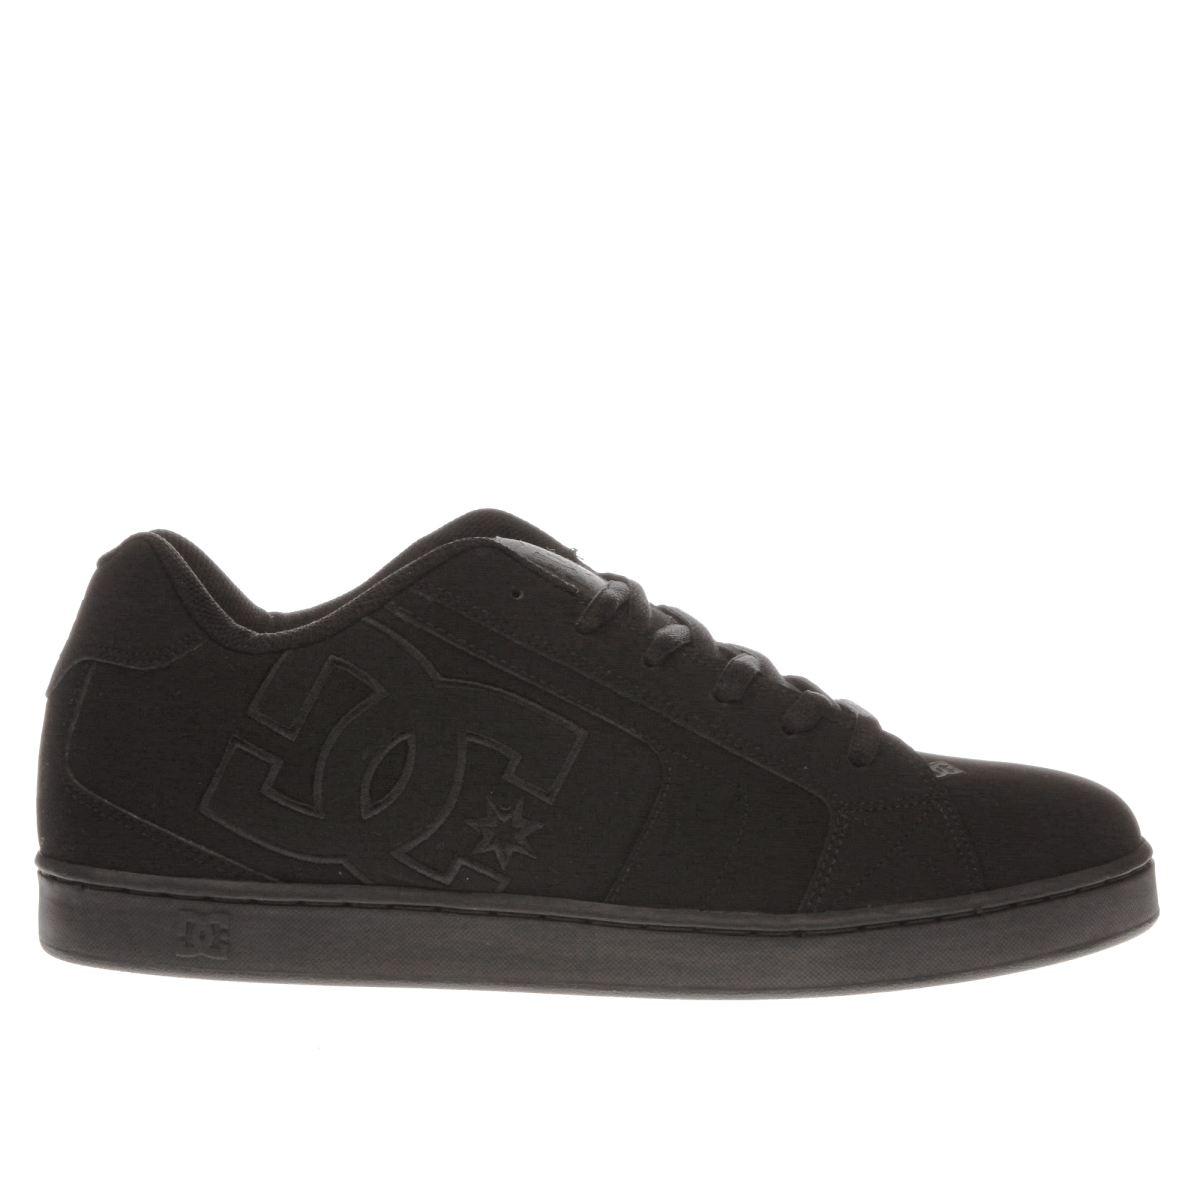 Skate shoes edinburgh - Dc Shoes Black Net Mens Trainers